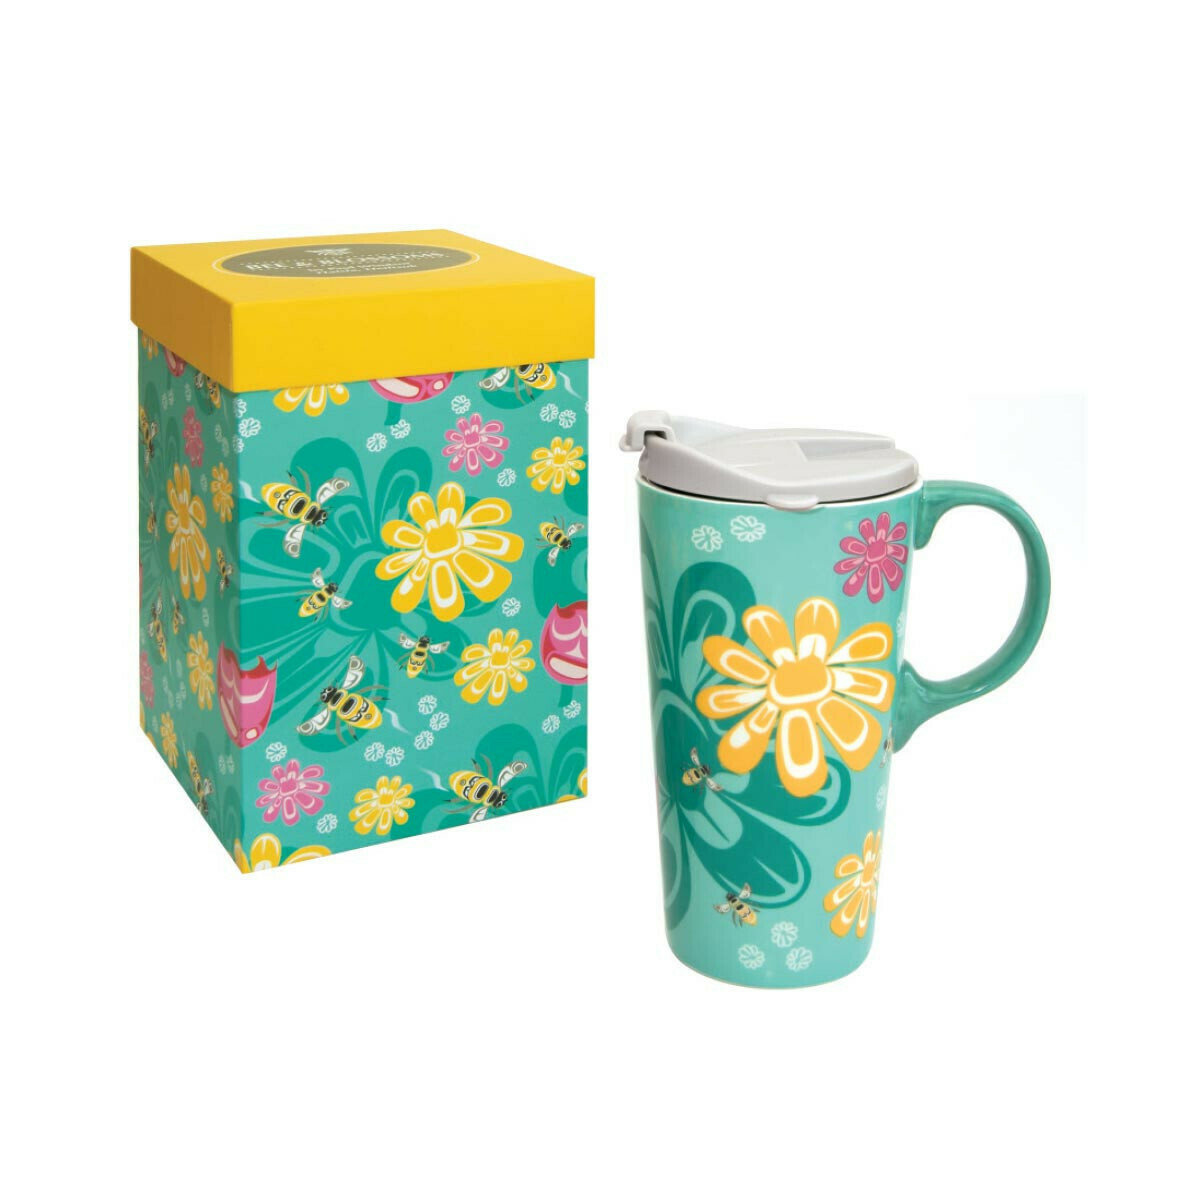 Perfect Mug - Bee and Blossoms